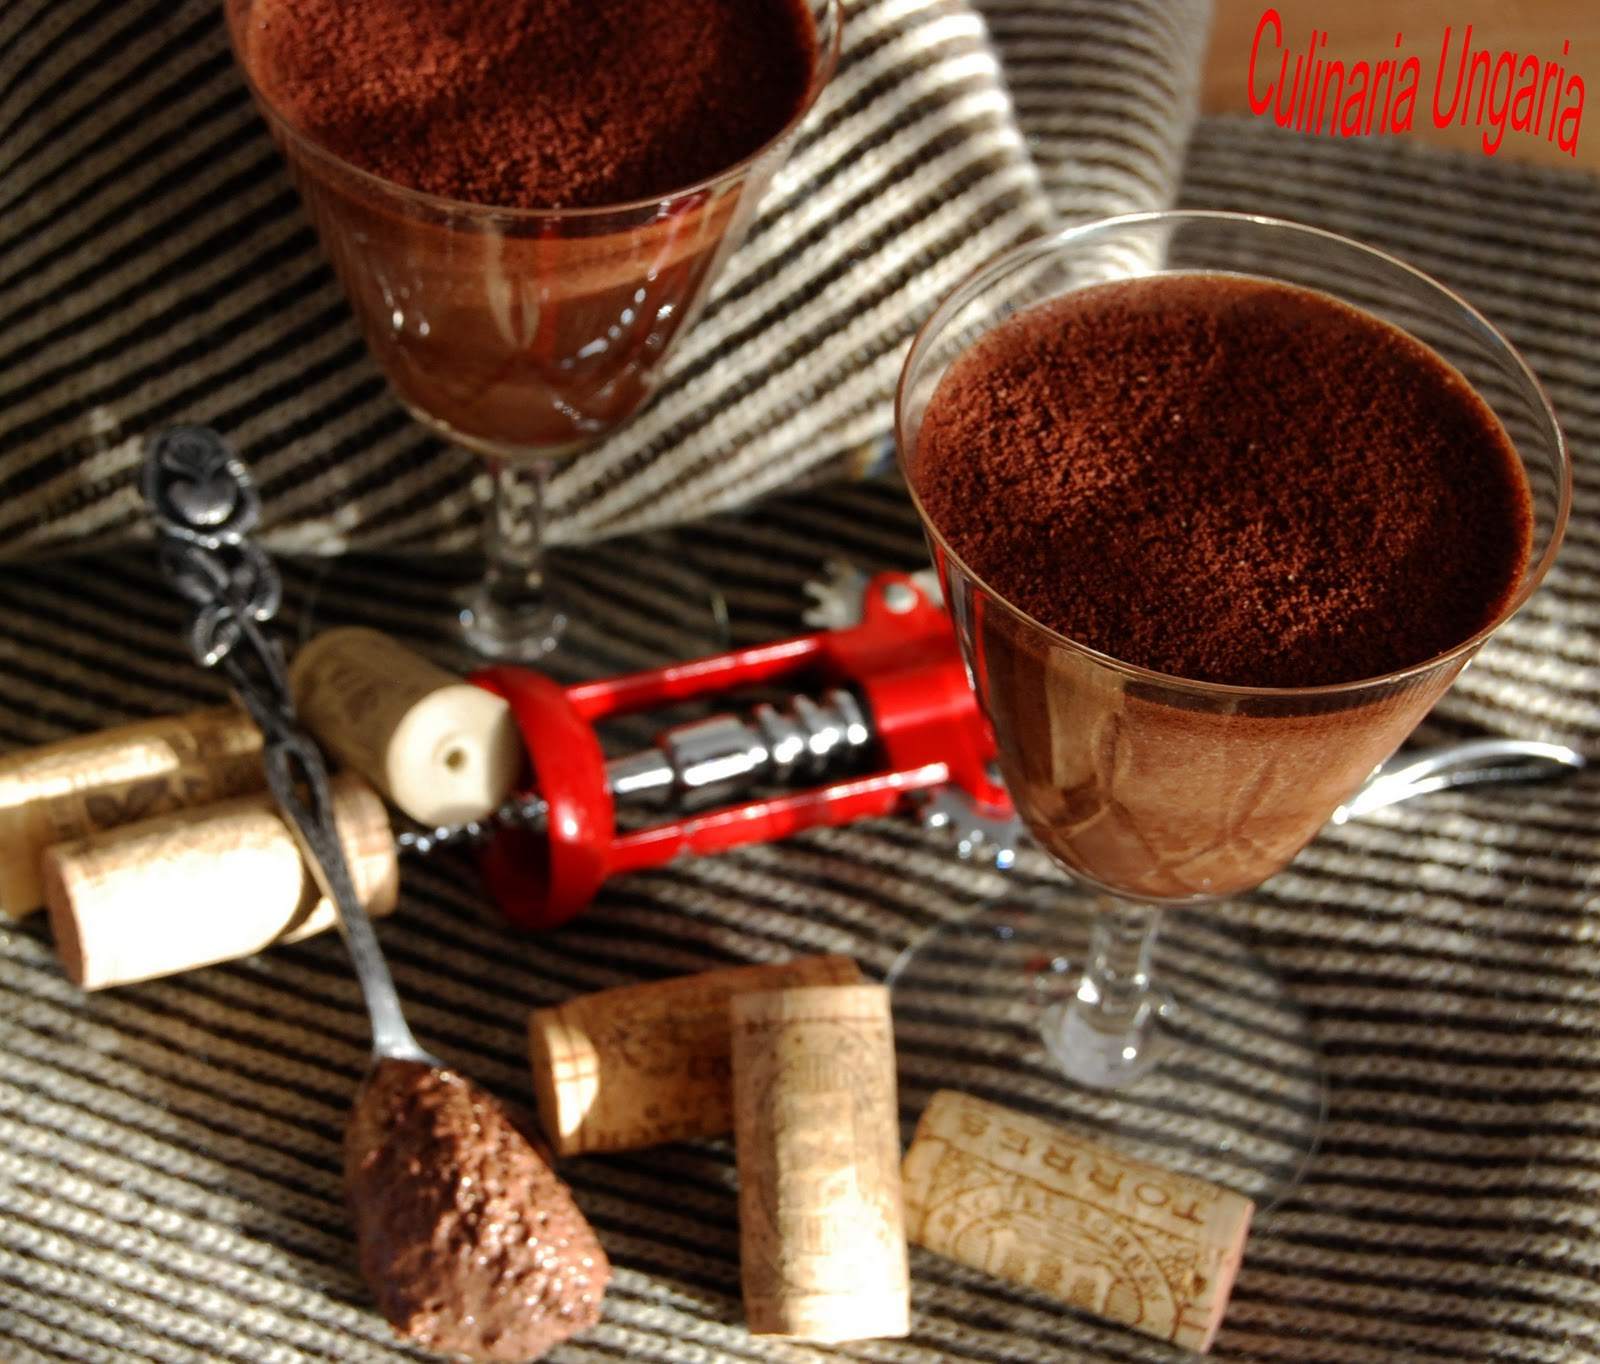 culinaria ungaria rotwein schokoladen mousse. Black Bedroom Furniture Sets. Home Design Ideas